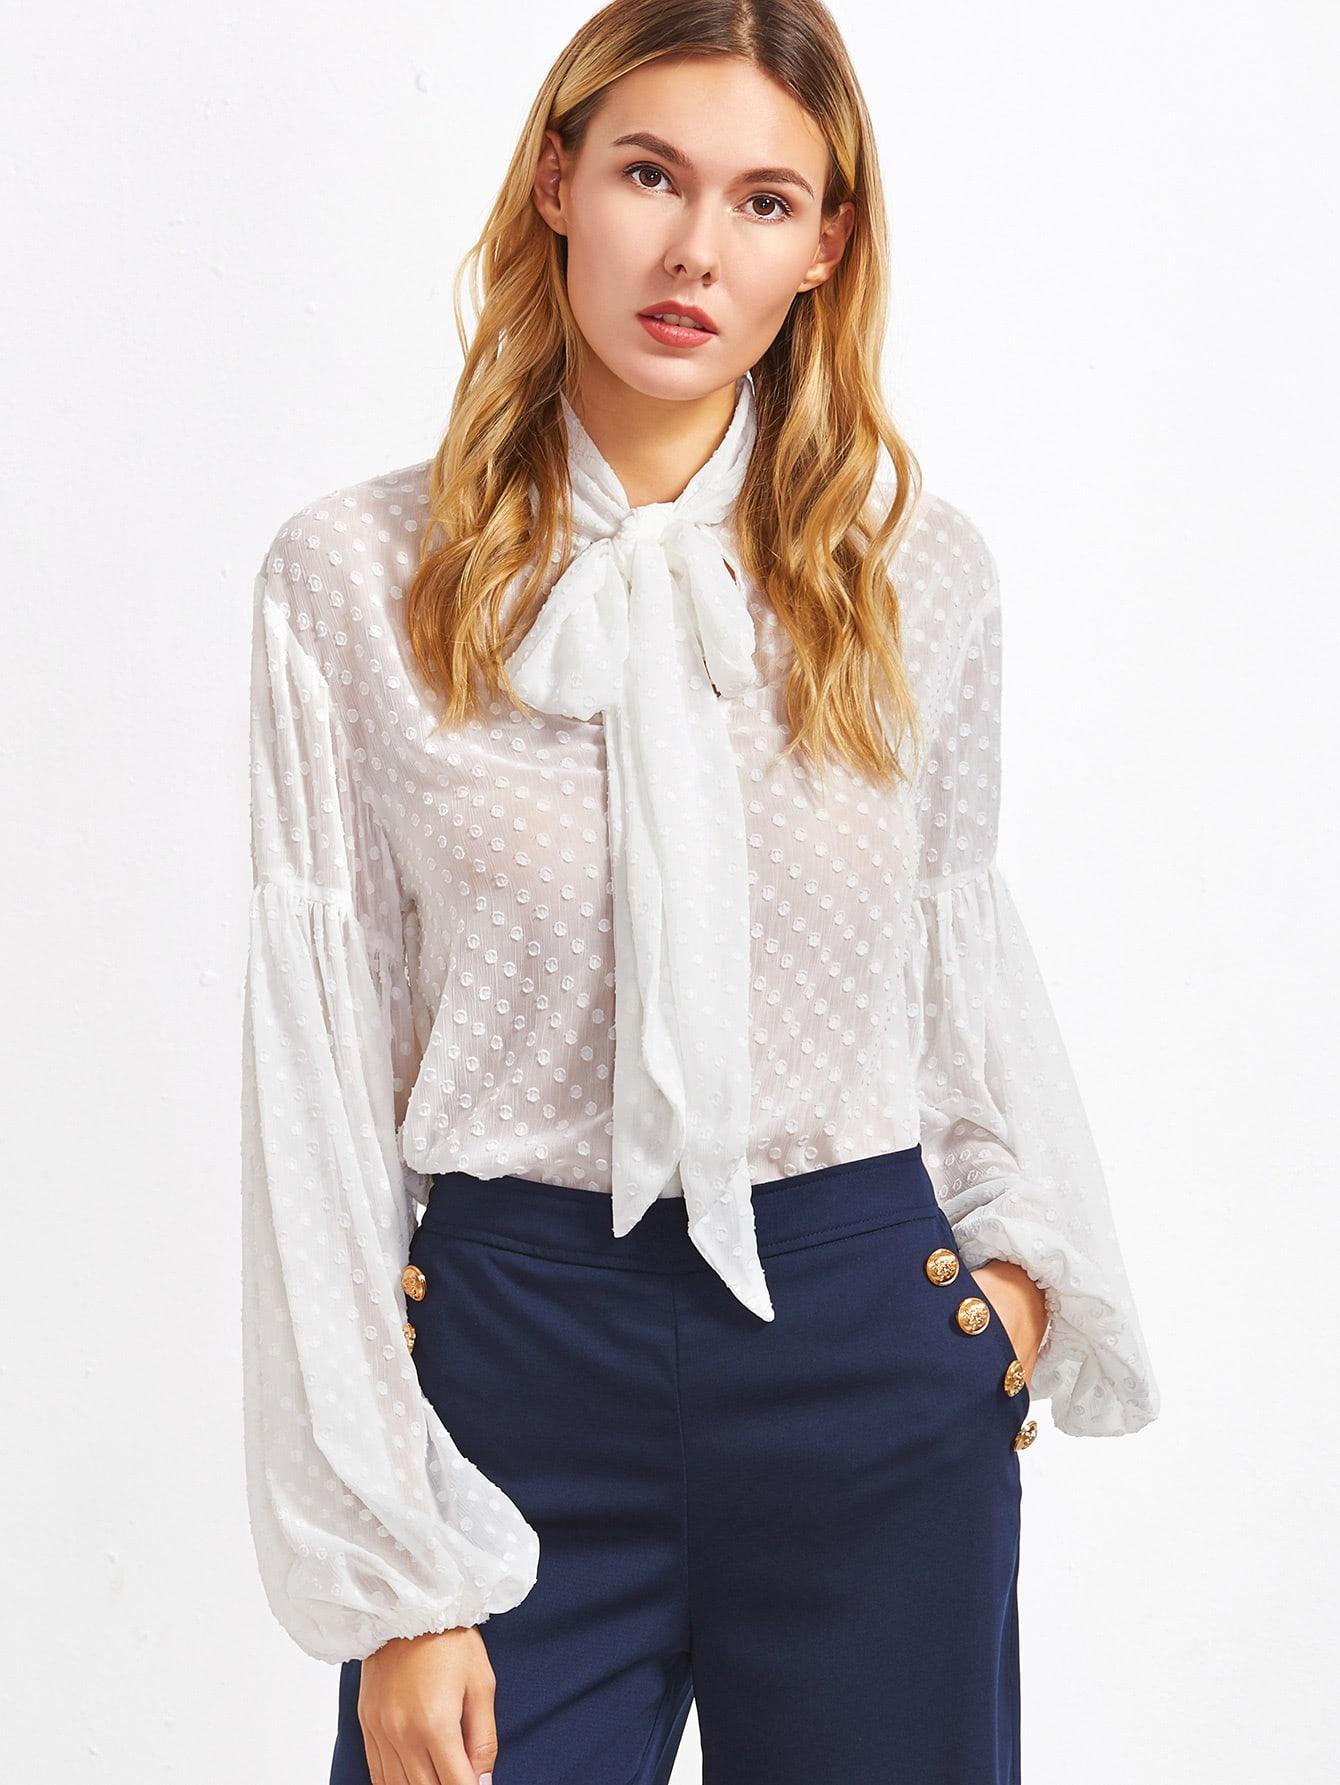 blouse161121701_2